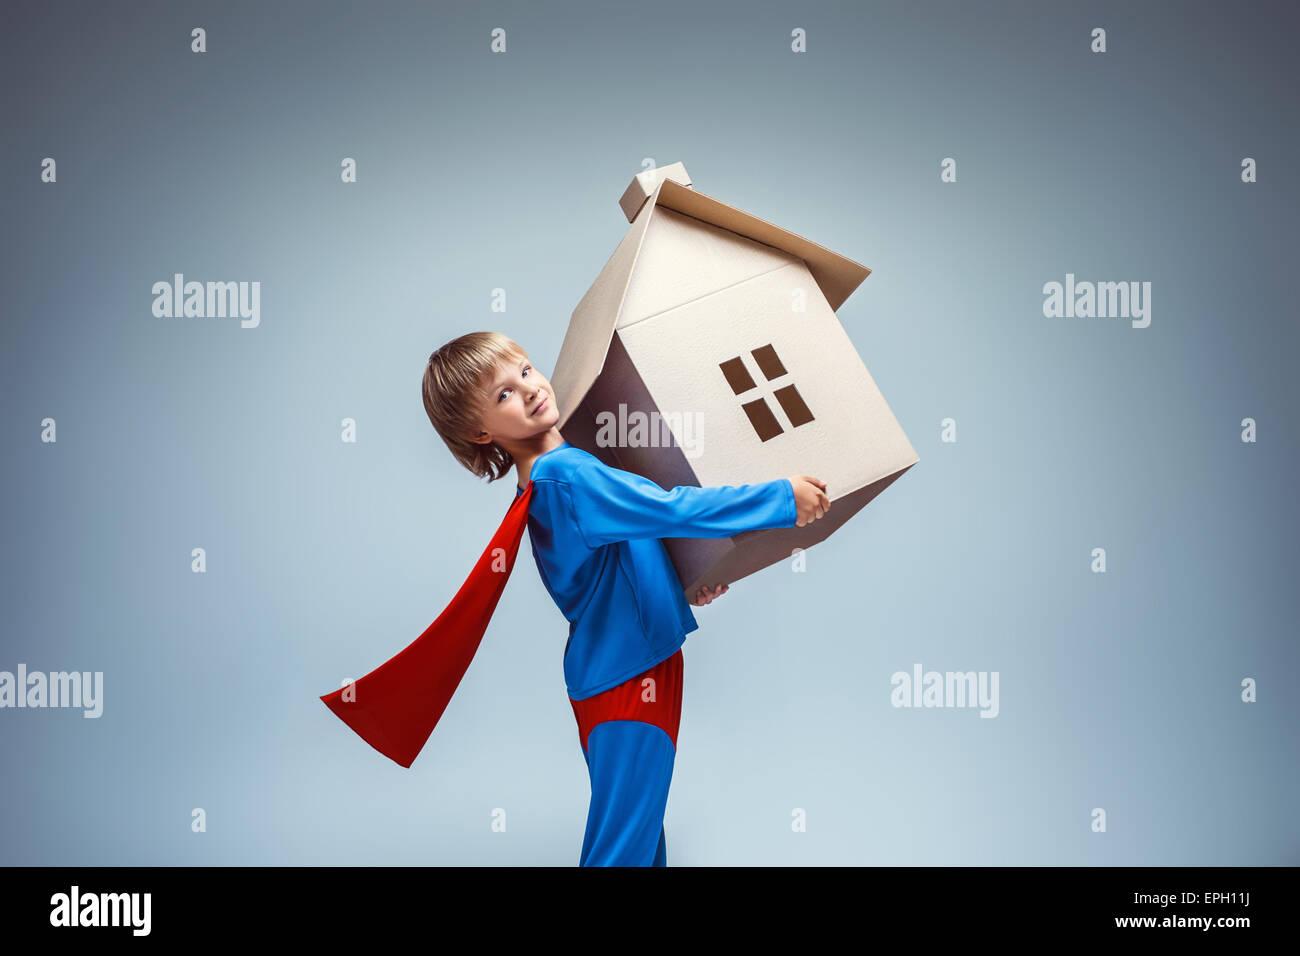 Rescuer - Stock Image